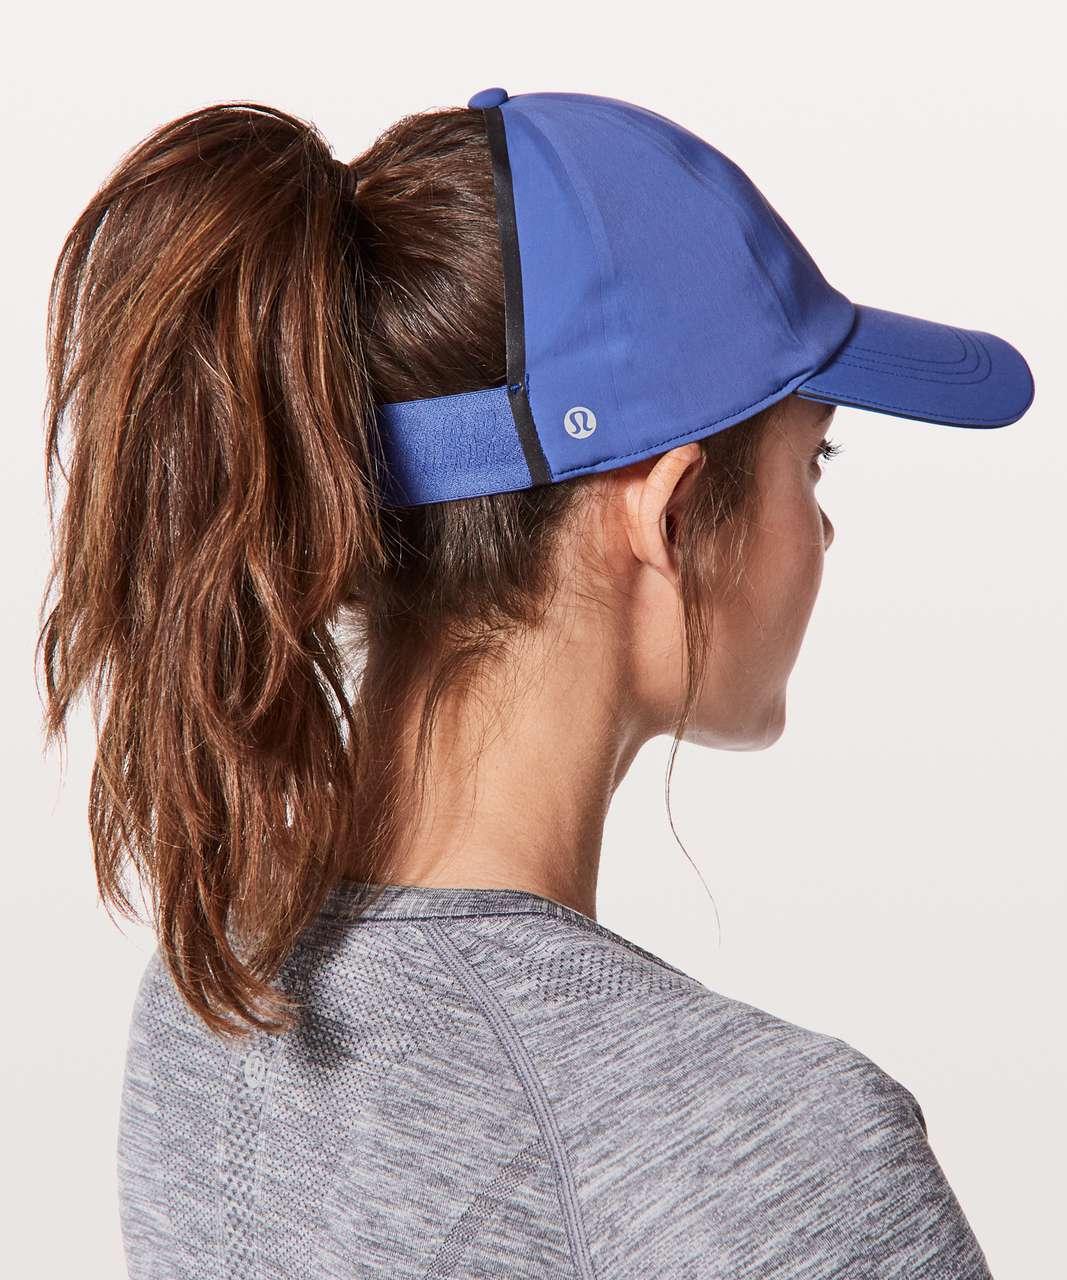 Lululemon Baller Hat Run  Ponytail - Moroccan Blue - lulu fanatics c898153b3c5